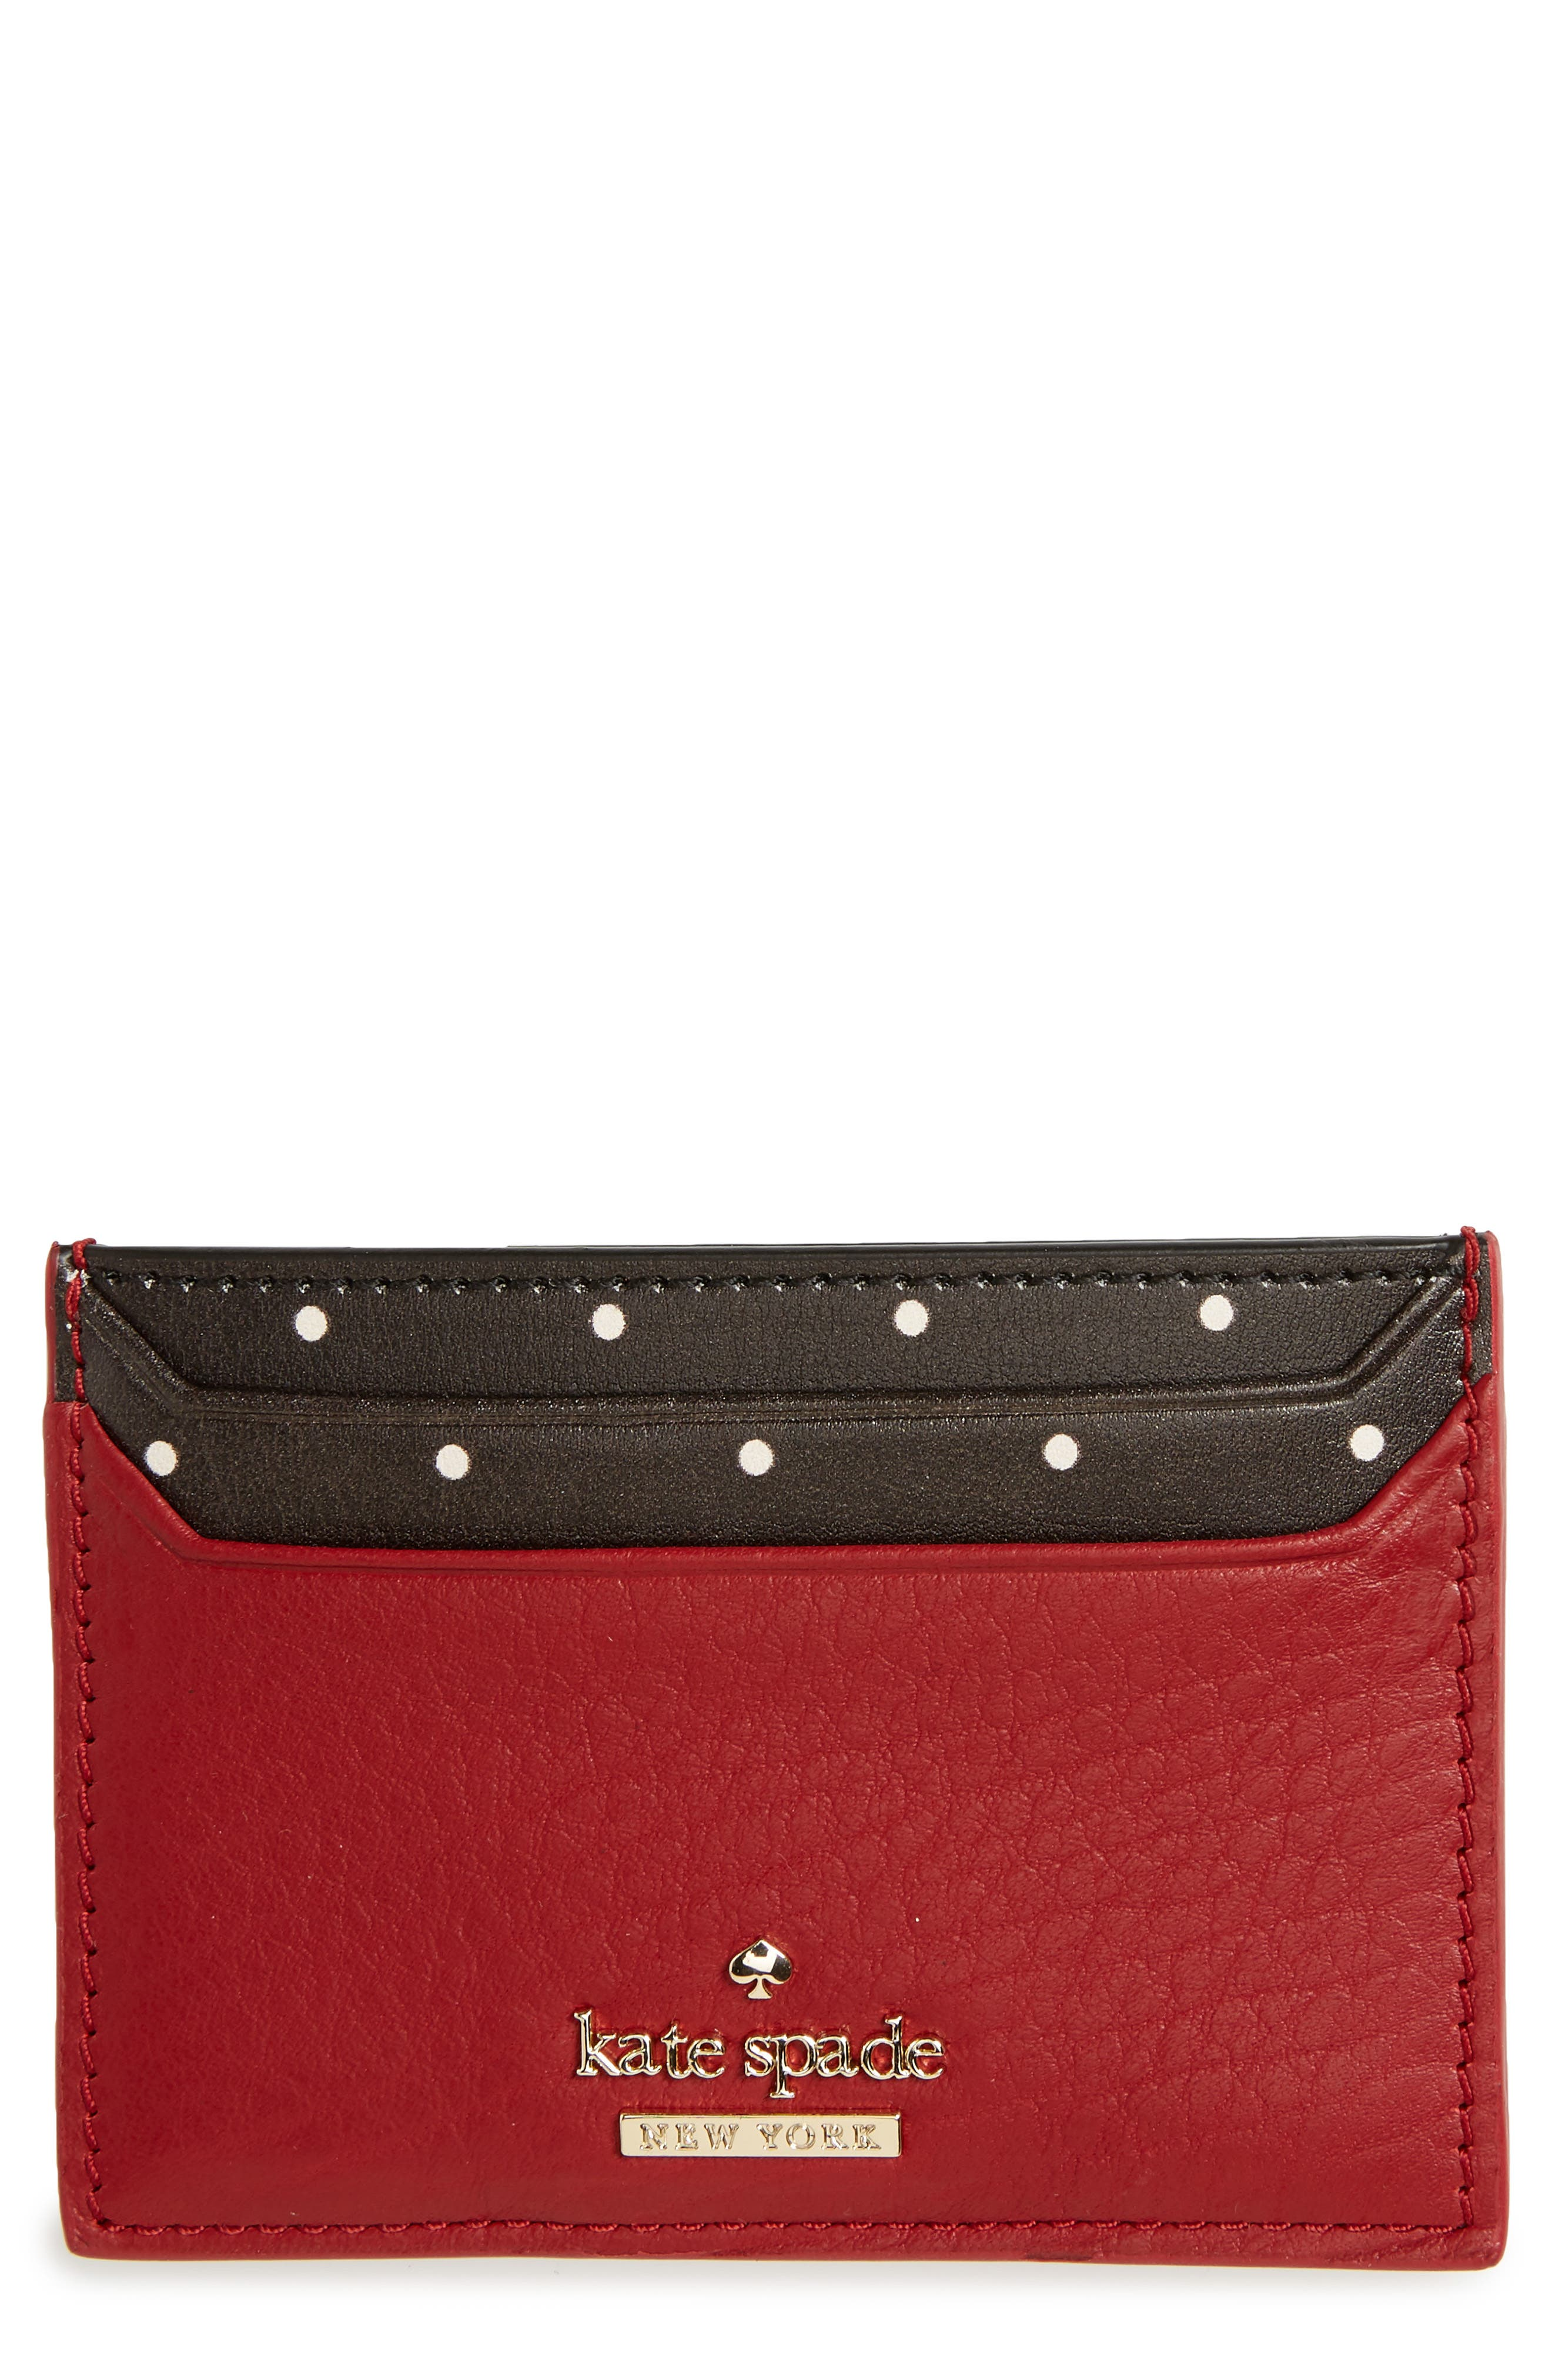 KATE SPADE NEW YORK, blake street - dot lynleigh leather card case, Main thumbnail 1, color, 600